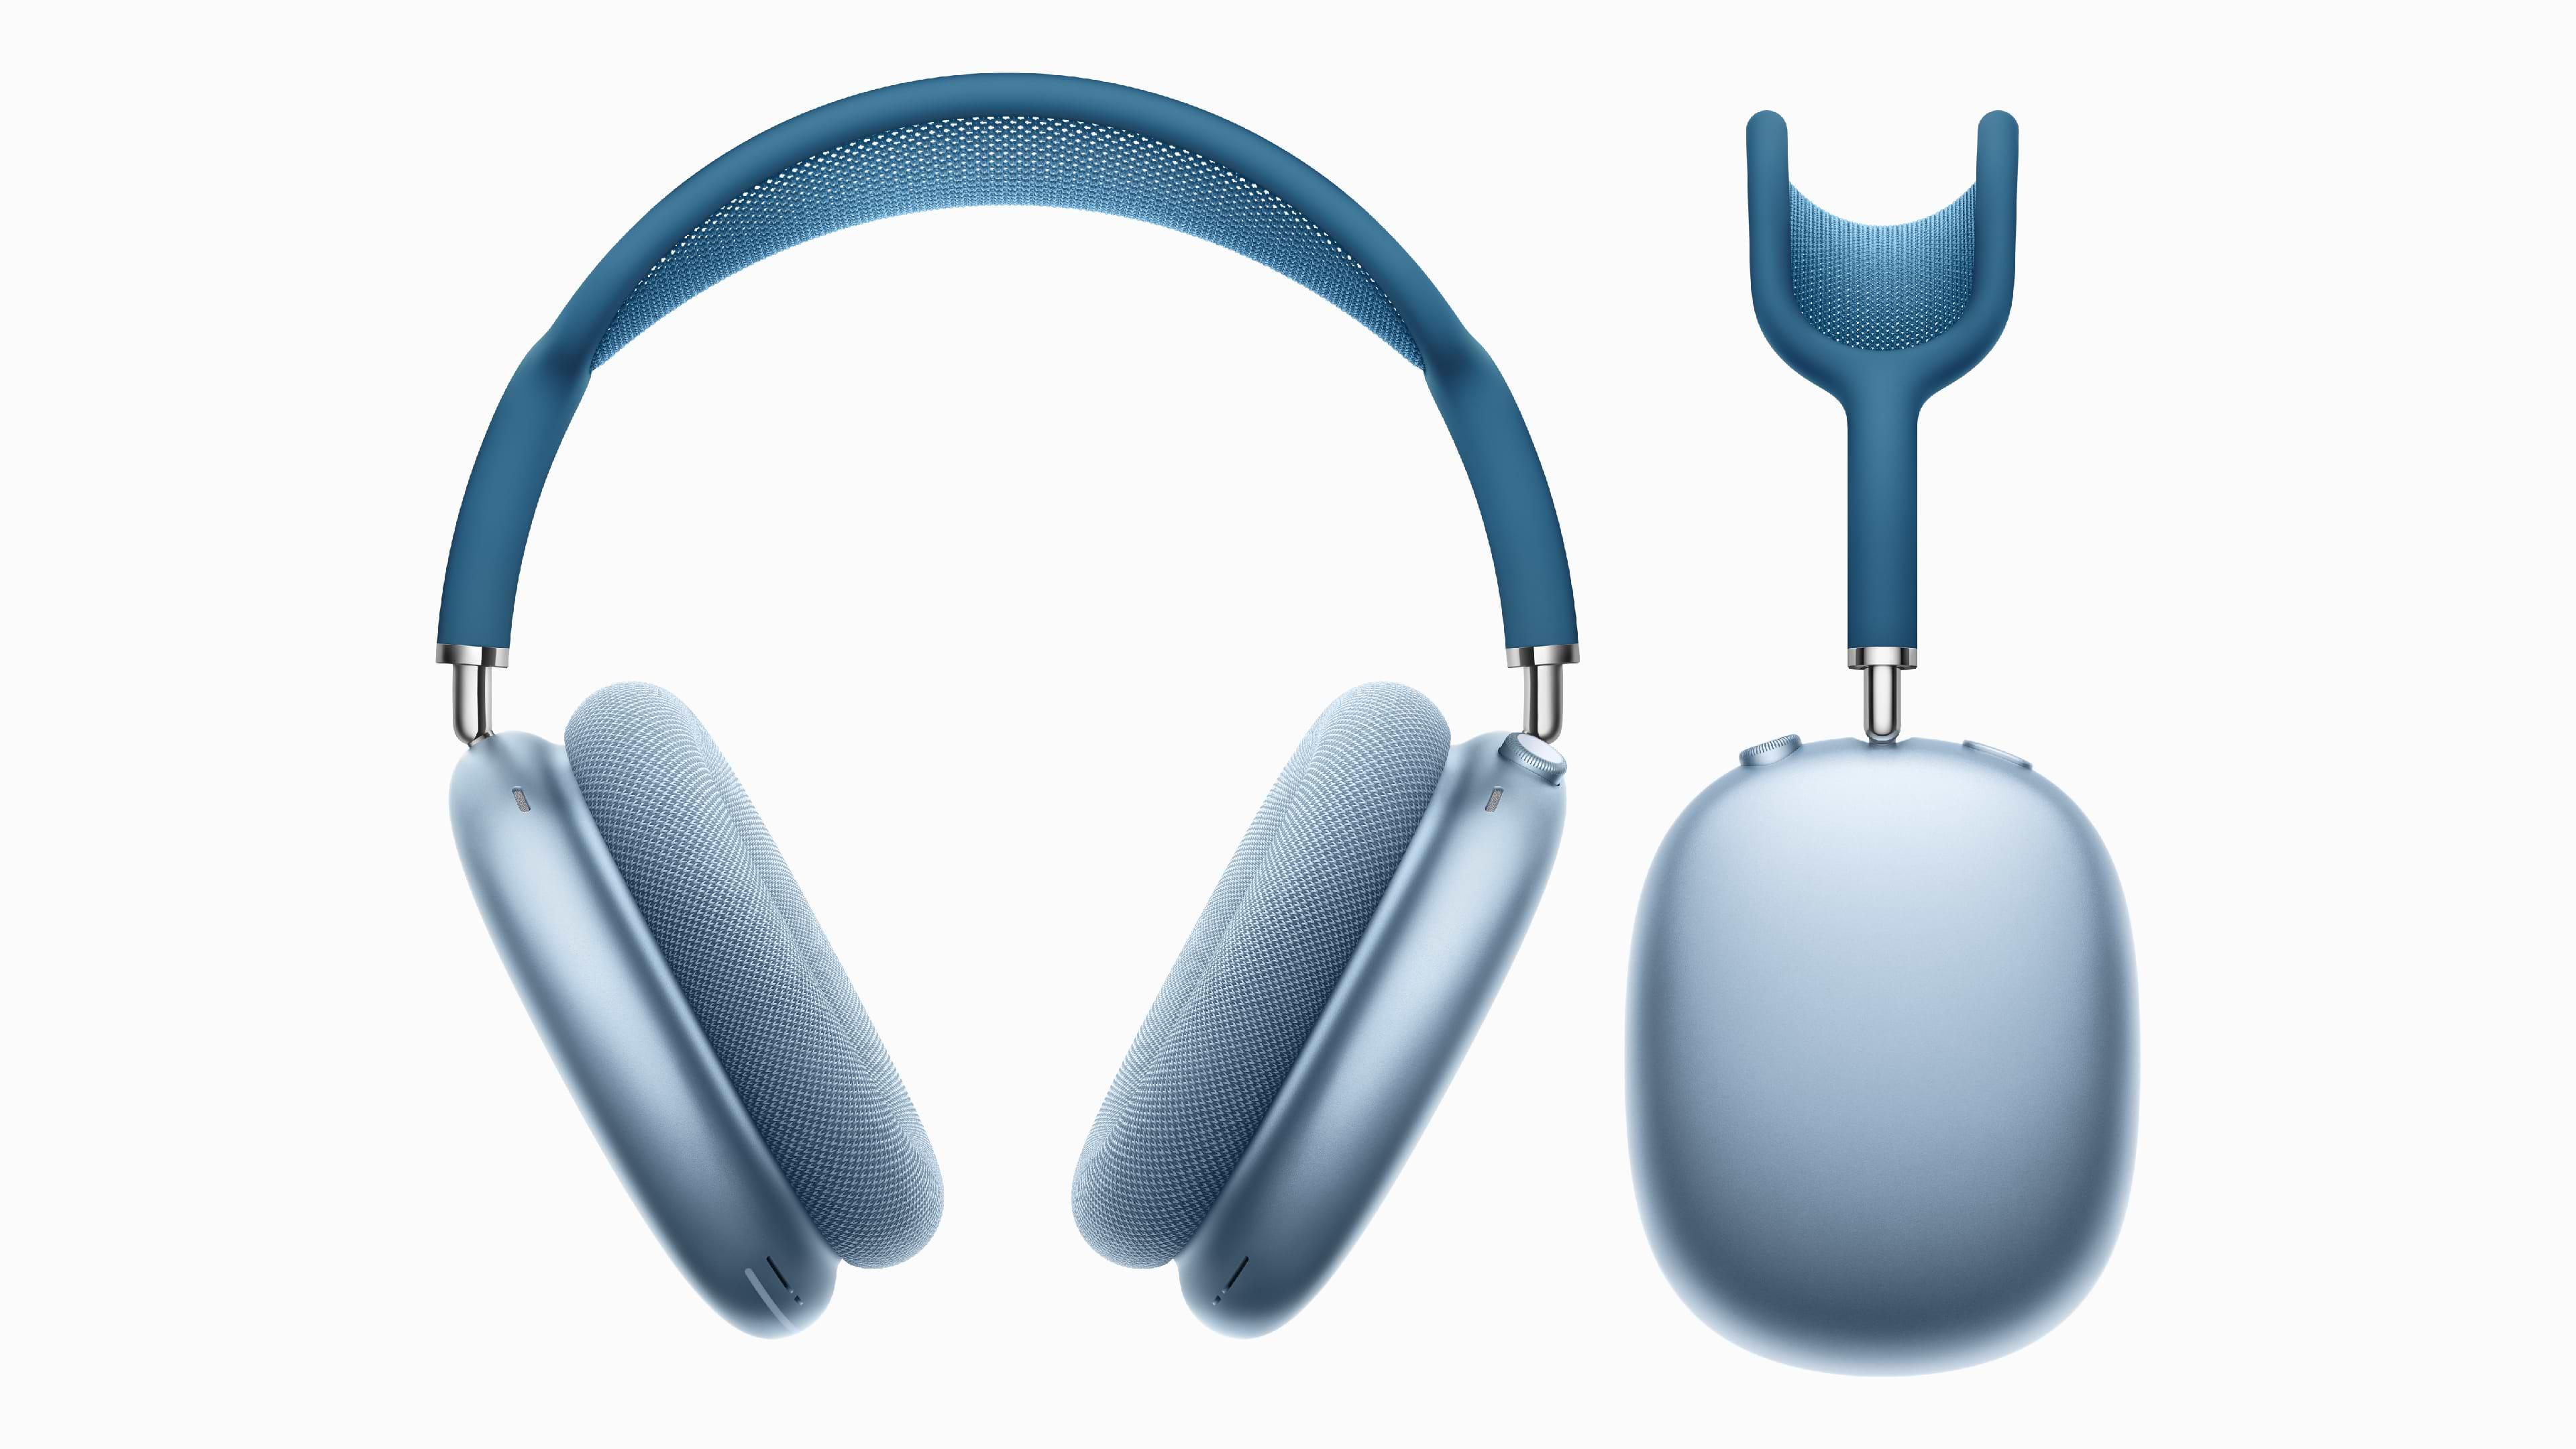 Apple מביאה את בשורת ה-AirPods Max, הקסם המוכר והאהוב של ה-AirPods באוזניות על-האוזן מעוצבות